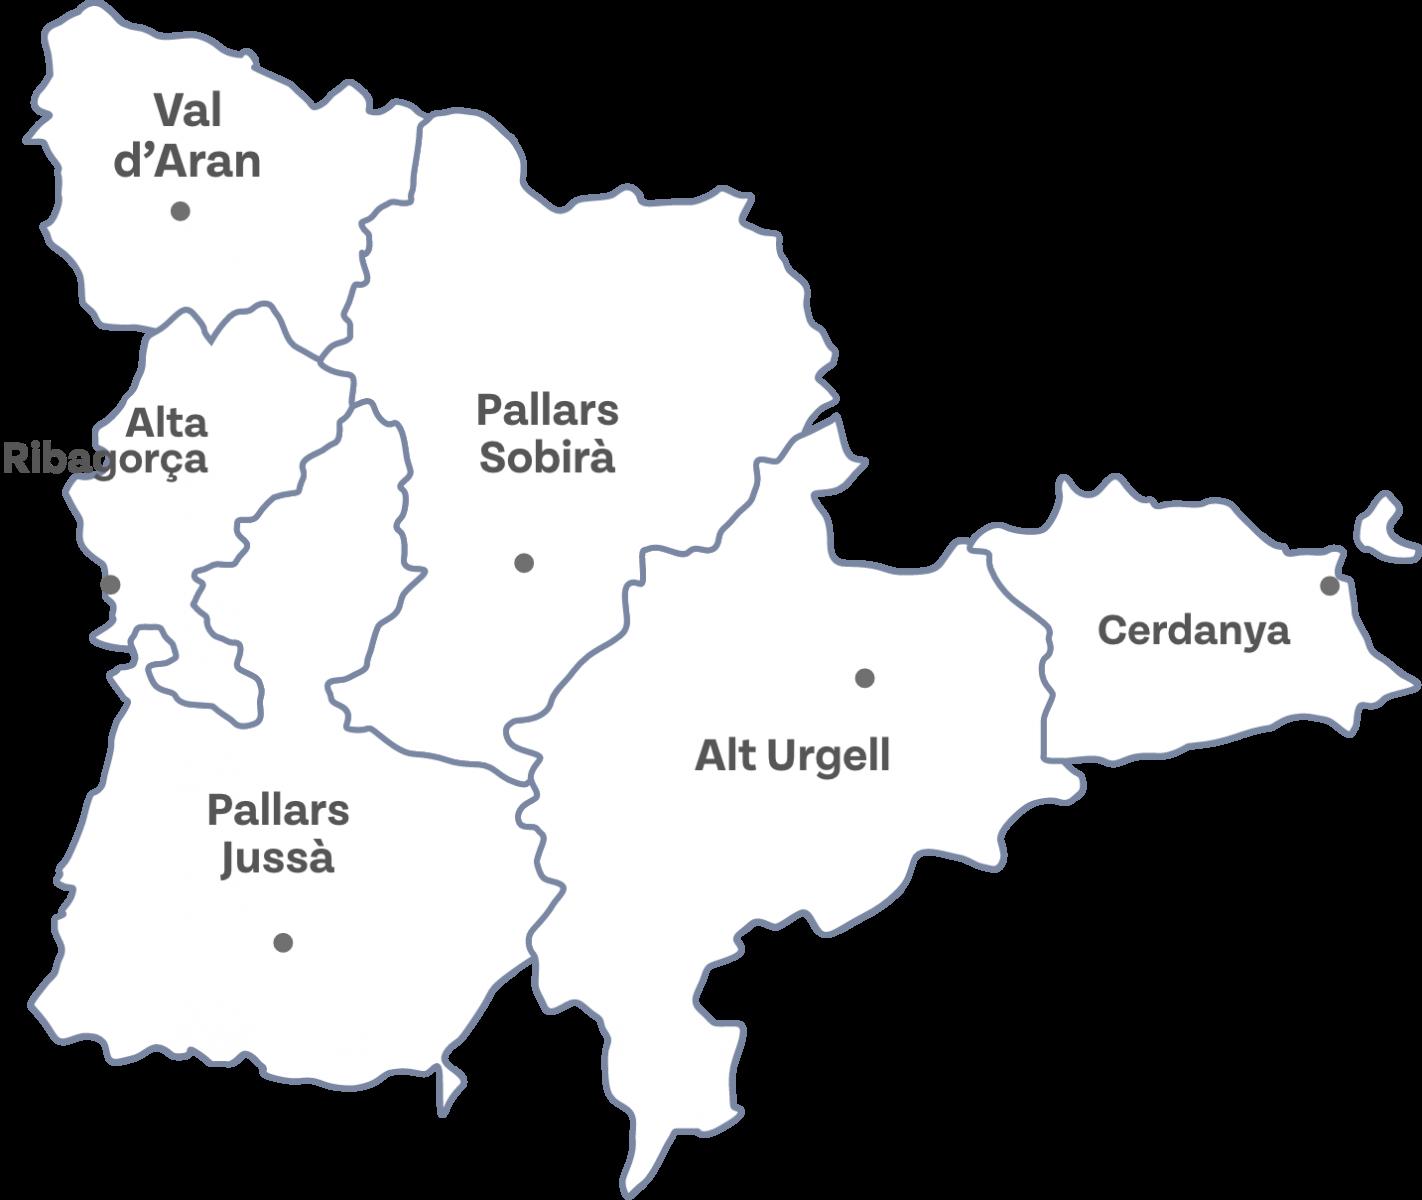 Mapa de Cerdenya